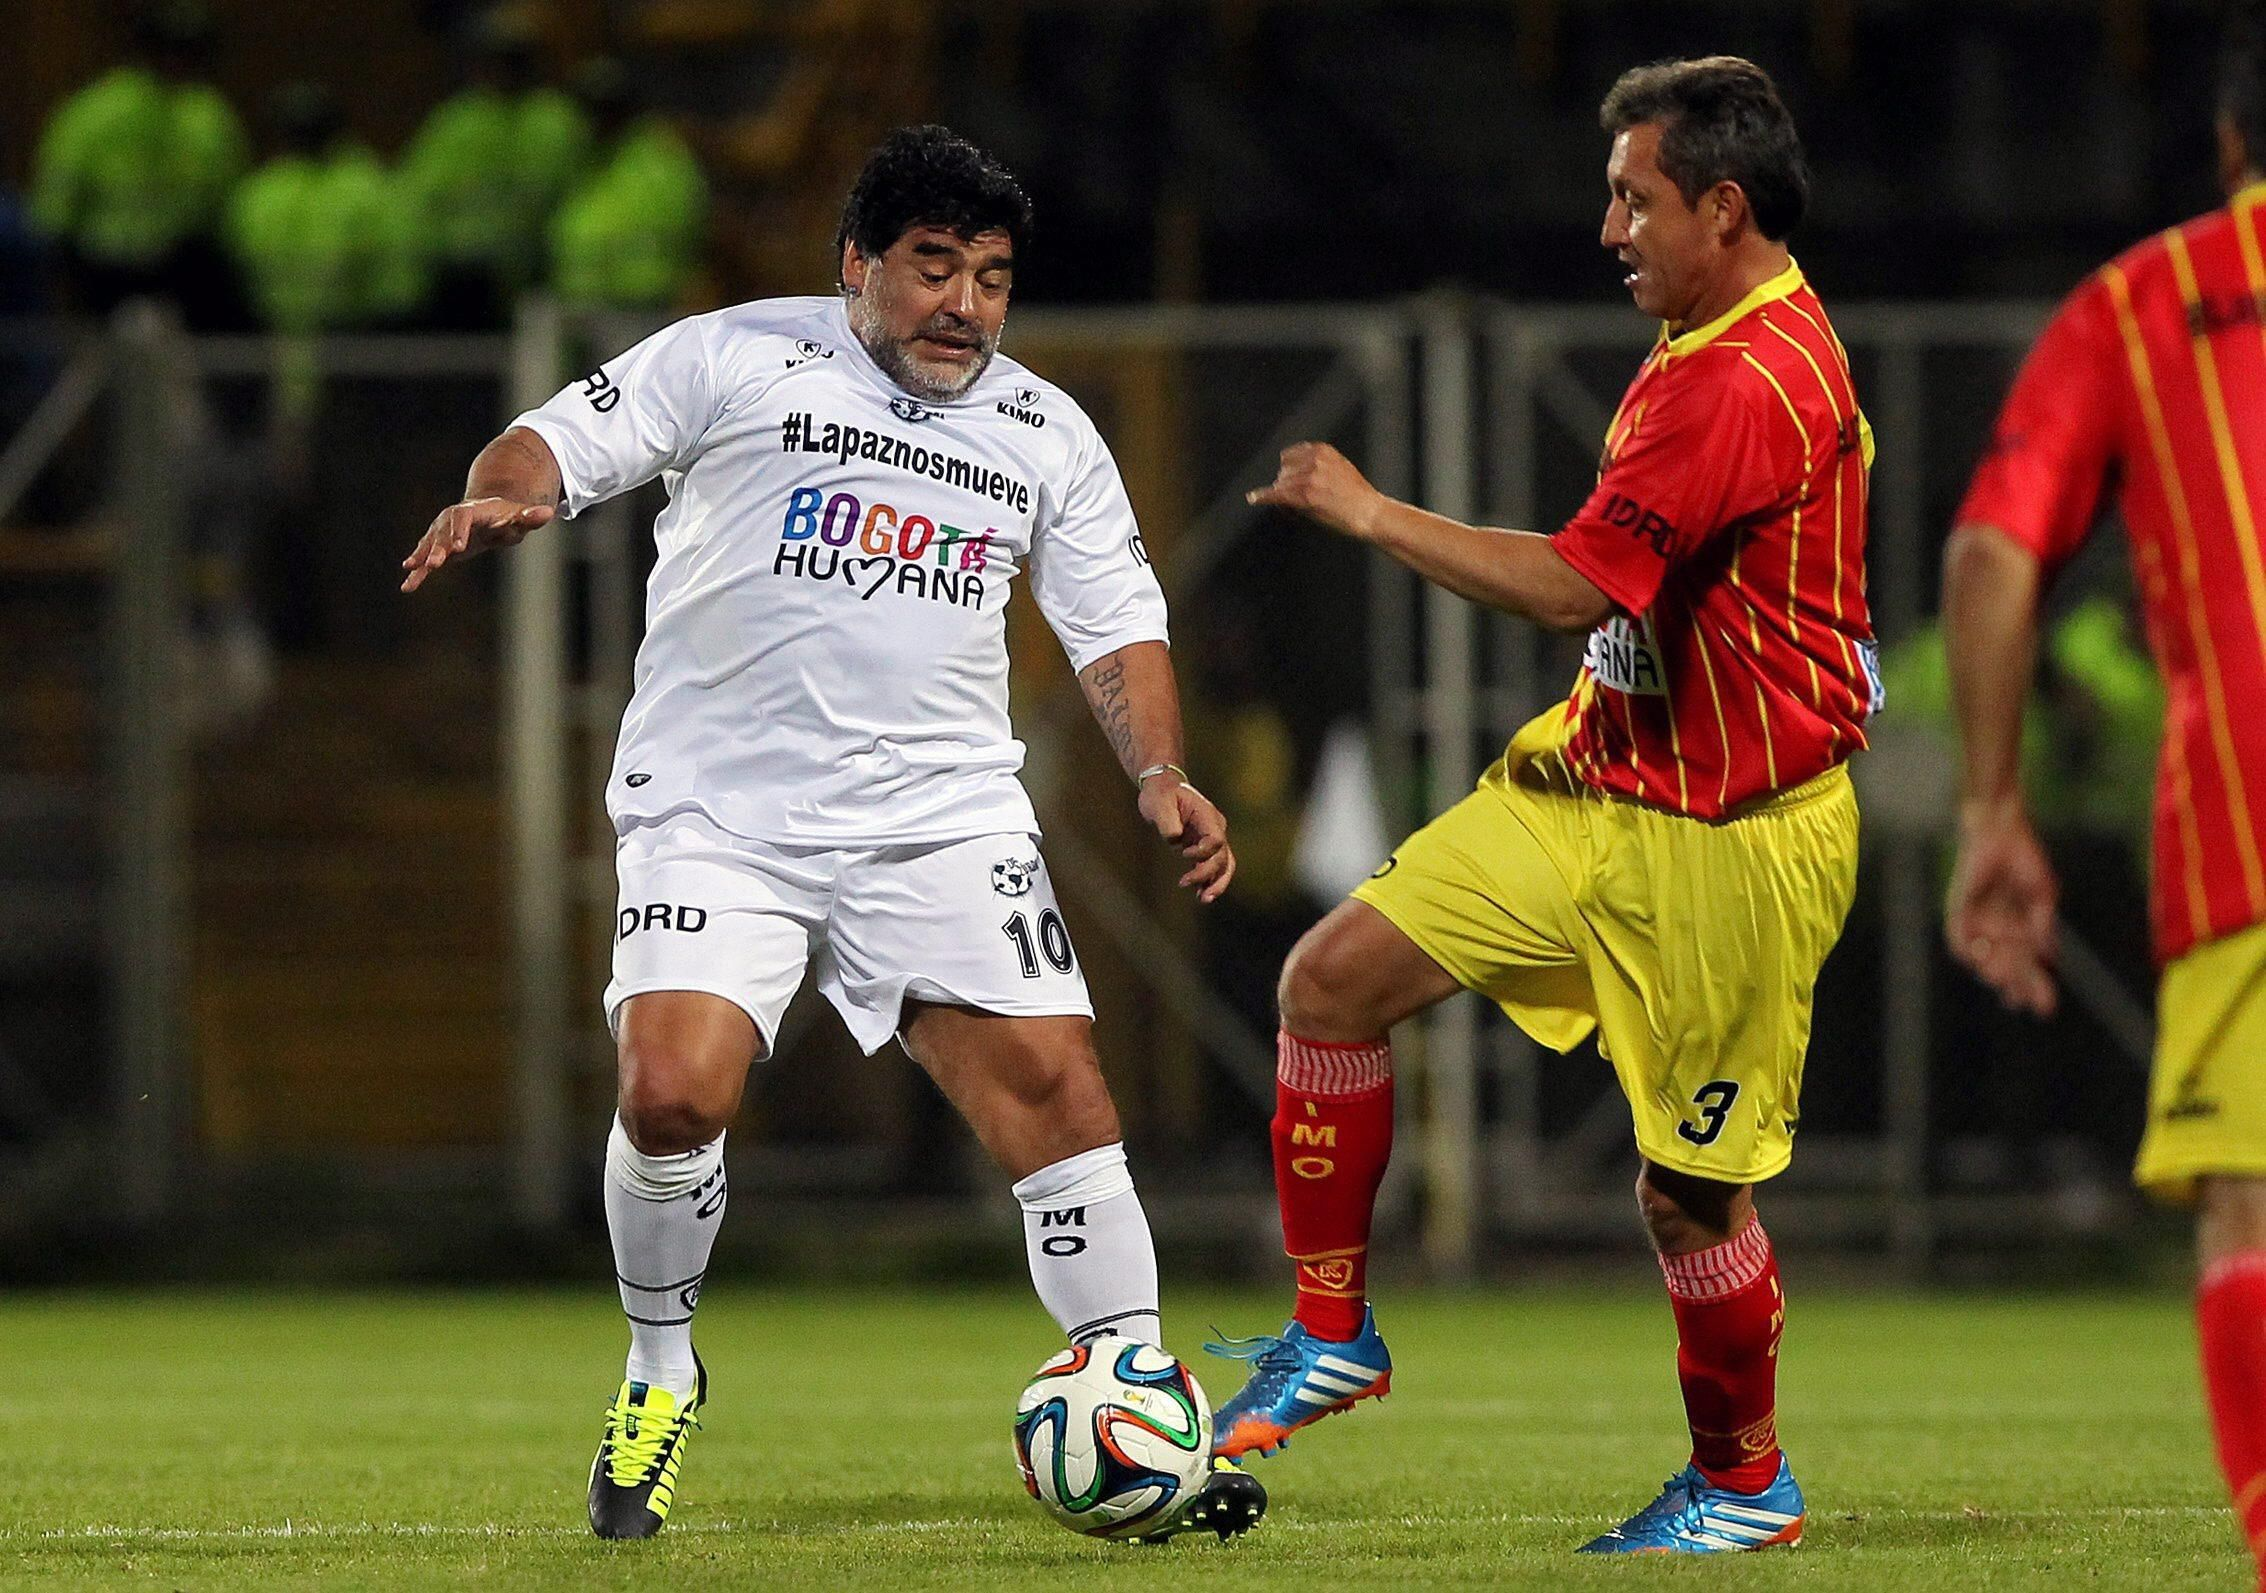 Former Argentinian soccer player Diego Armando Maradona in Colombia